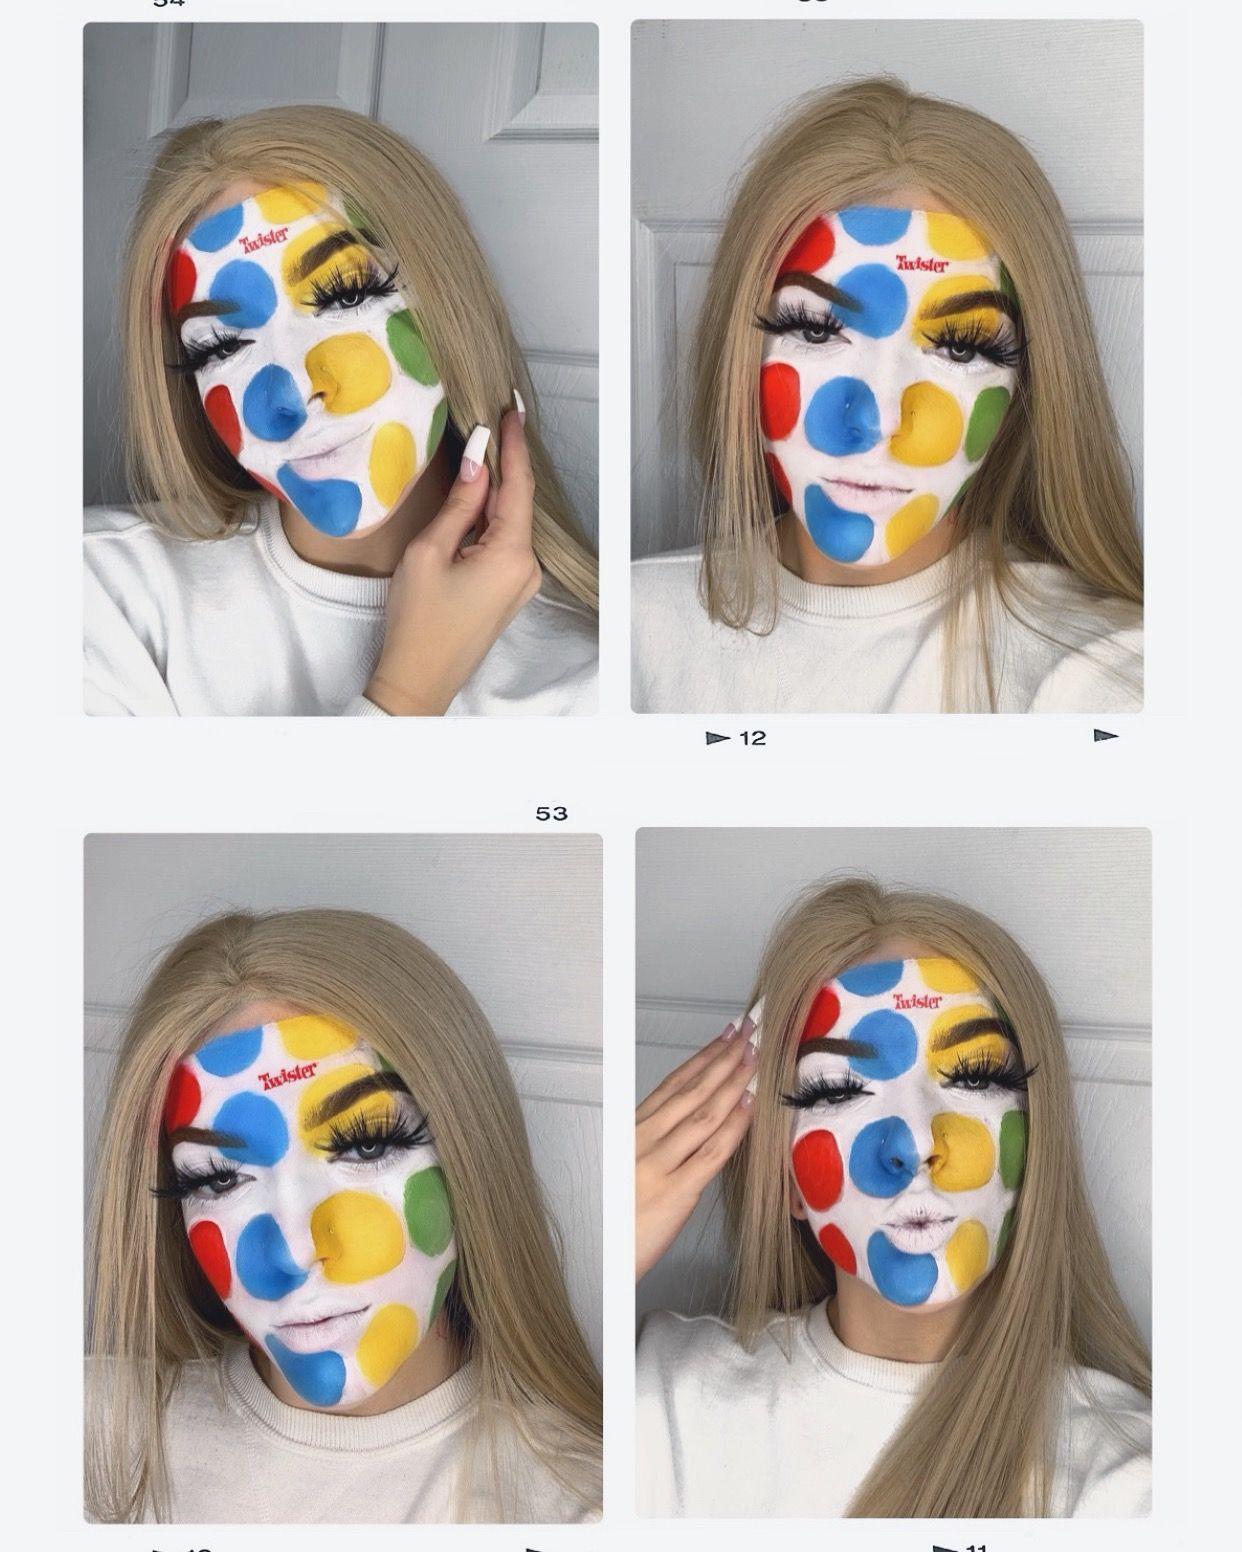 Twister board game Halloween makeup trendy 2019